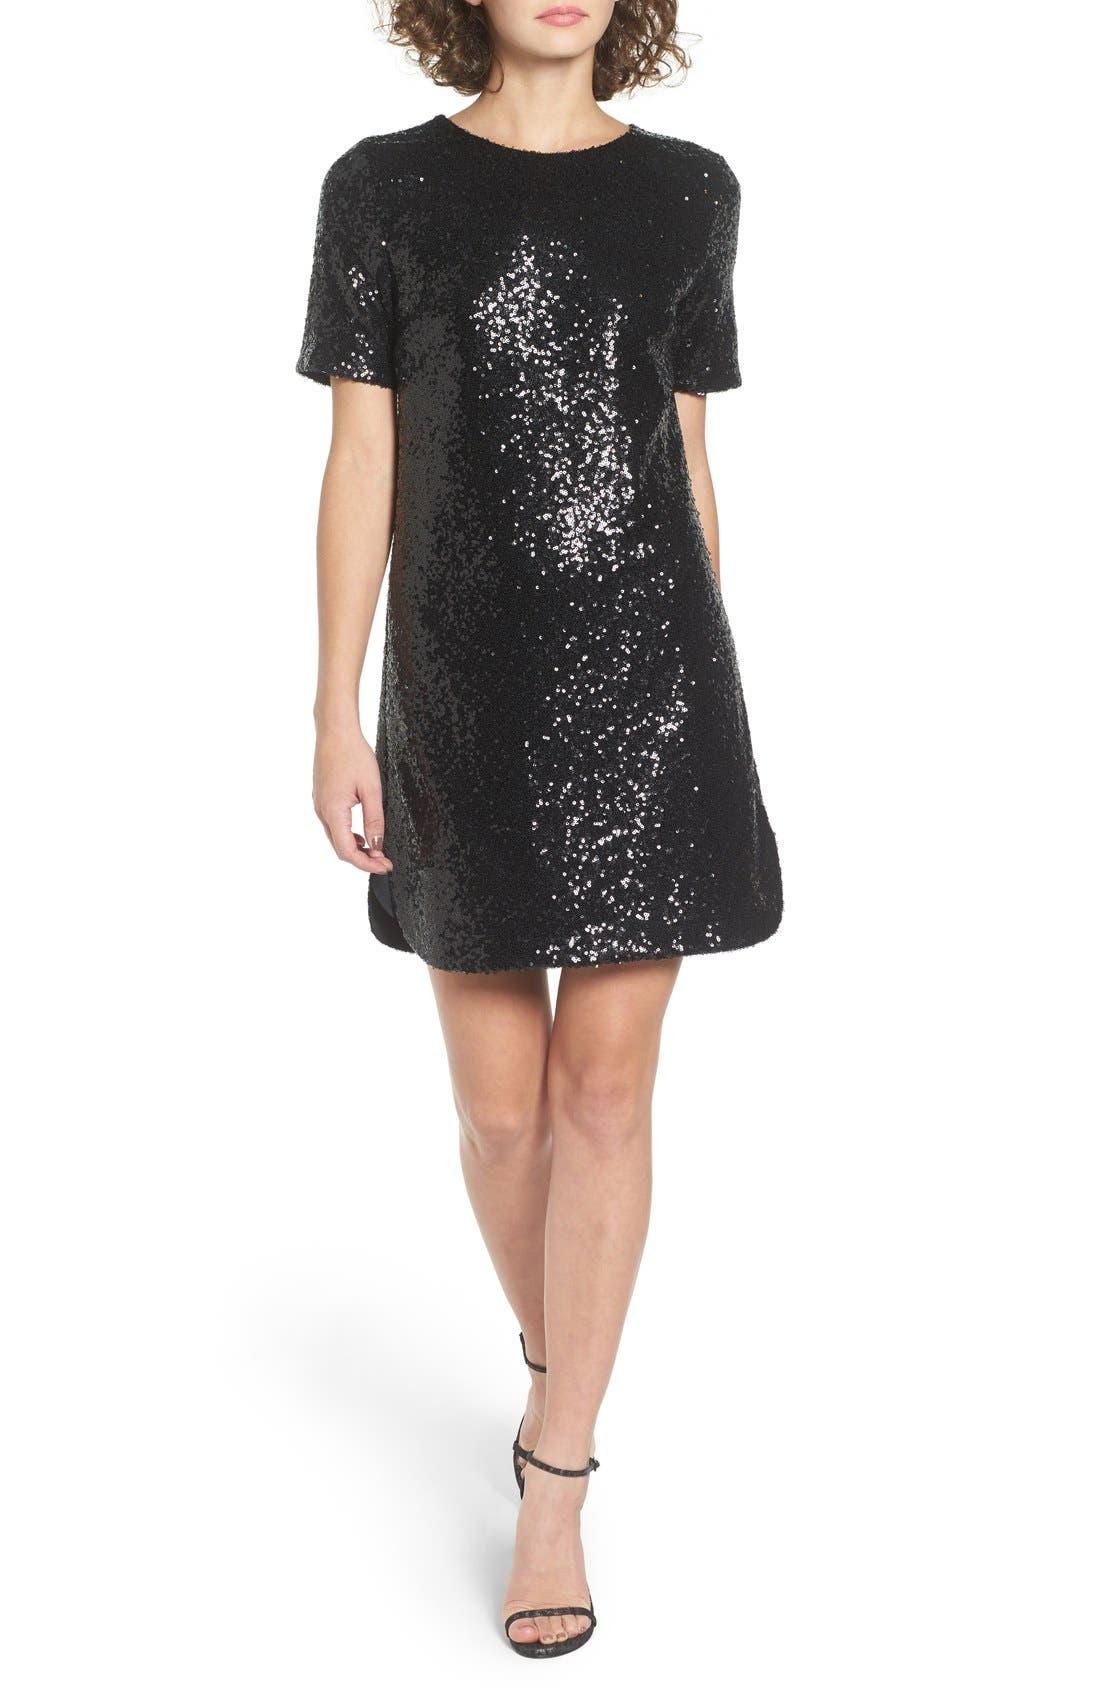 SOPRANO, Sequin T-Shirt Dress, Main thumbnail 1, color, 001